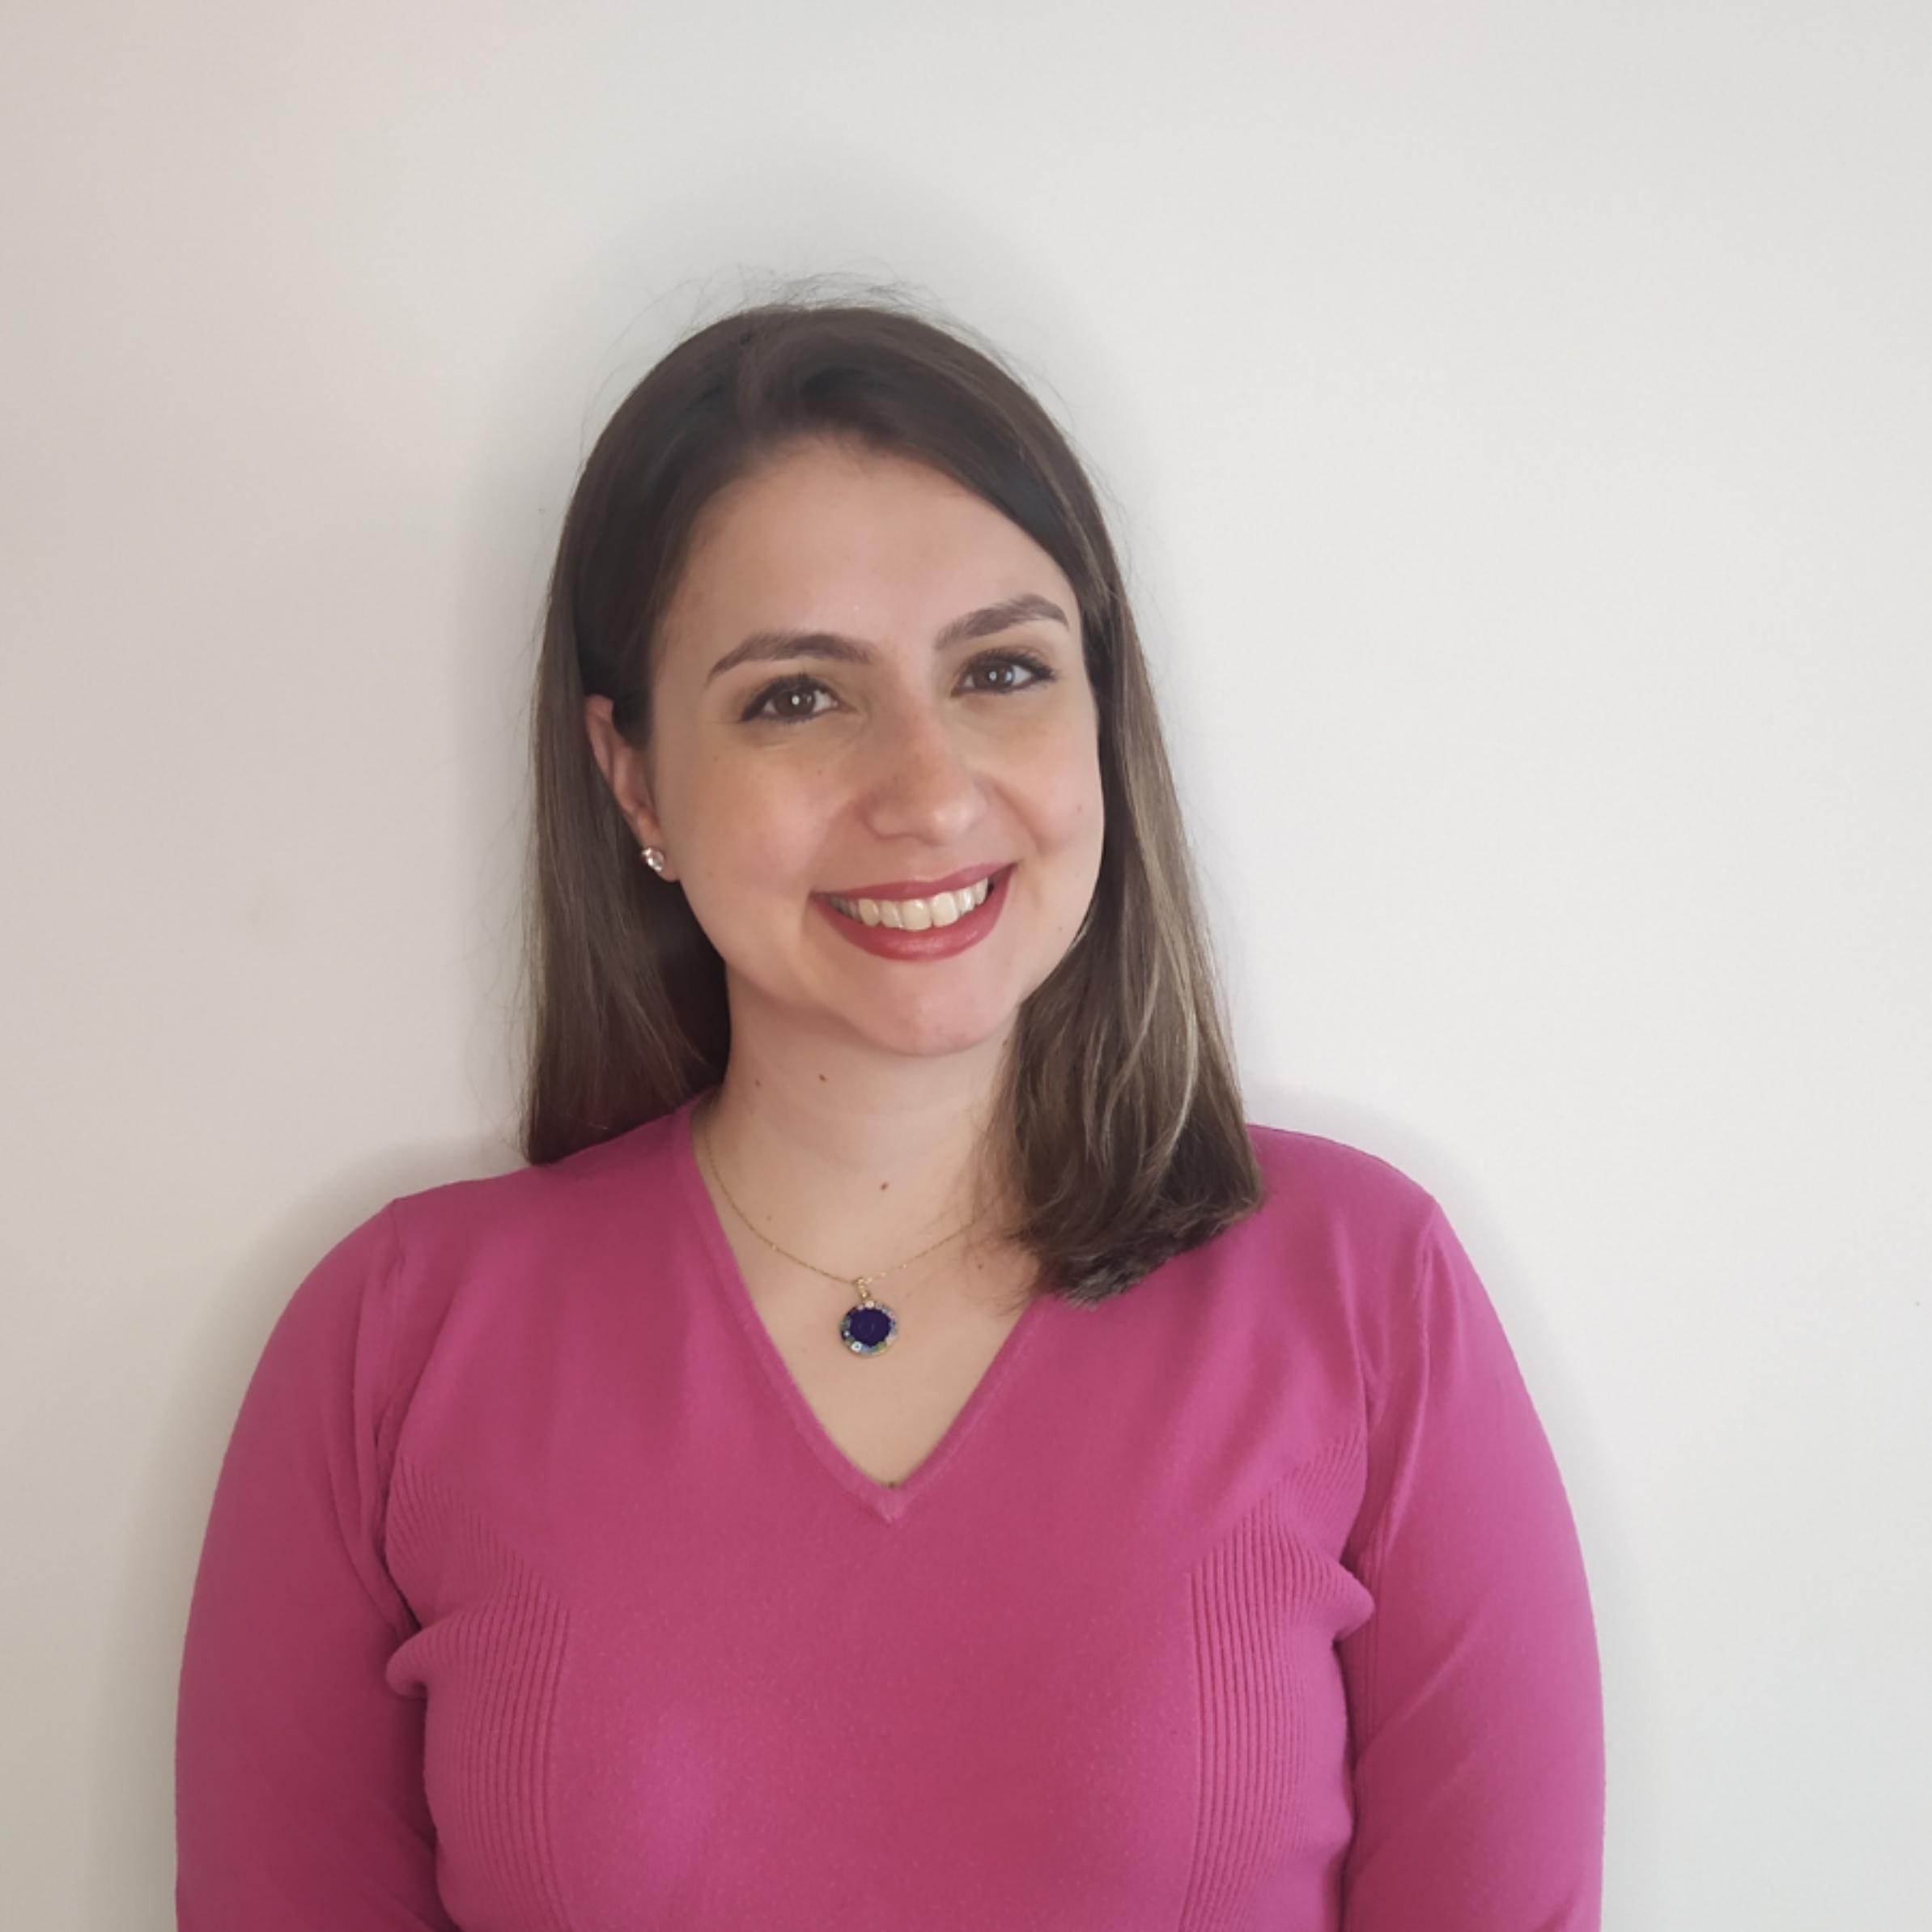 Daniela Matas